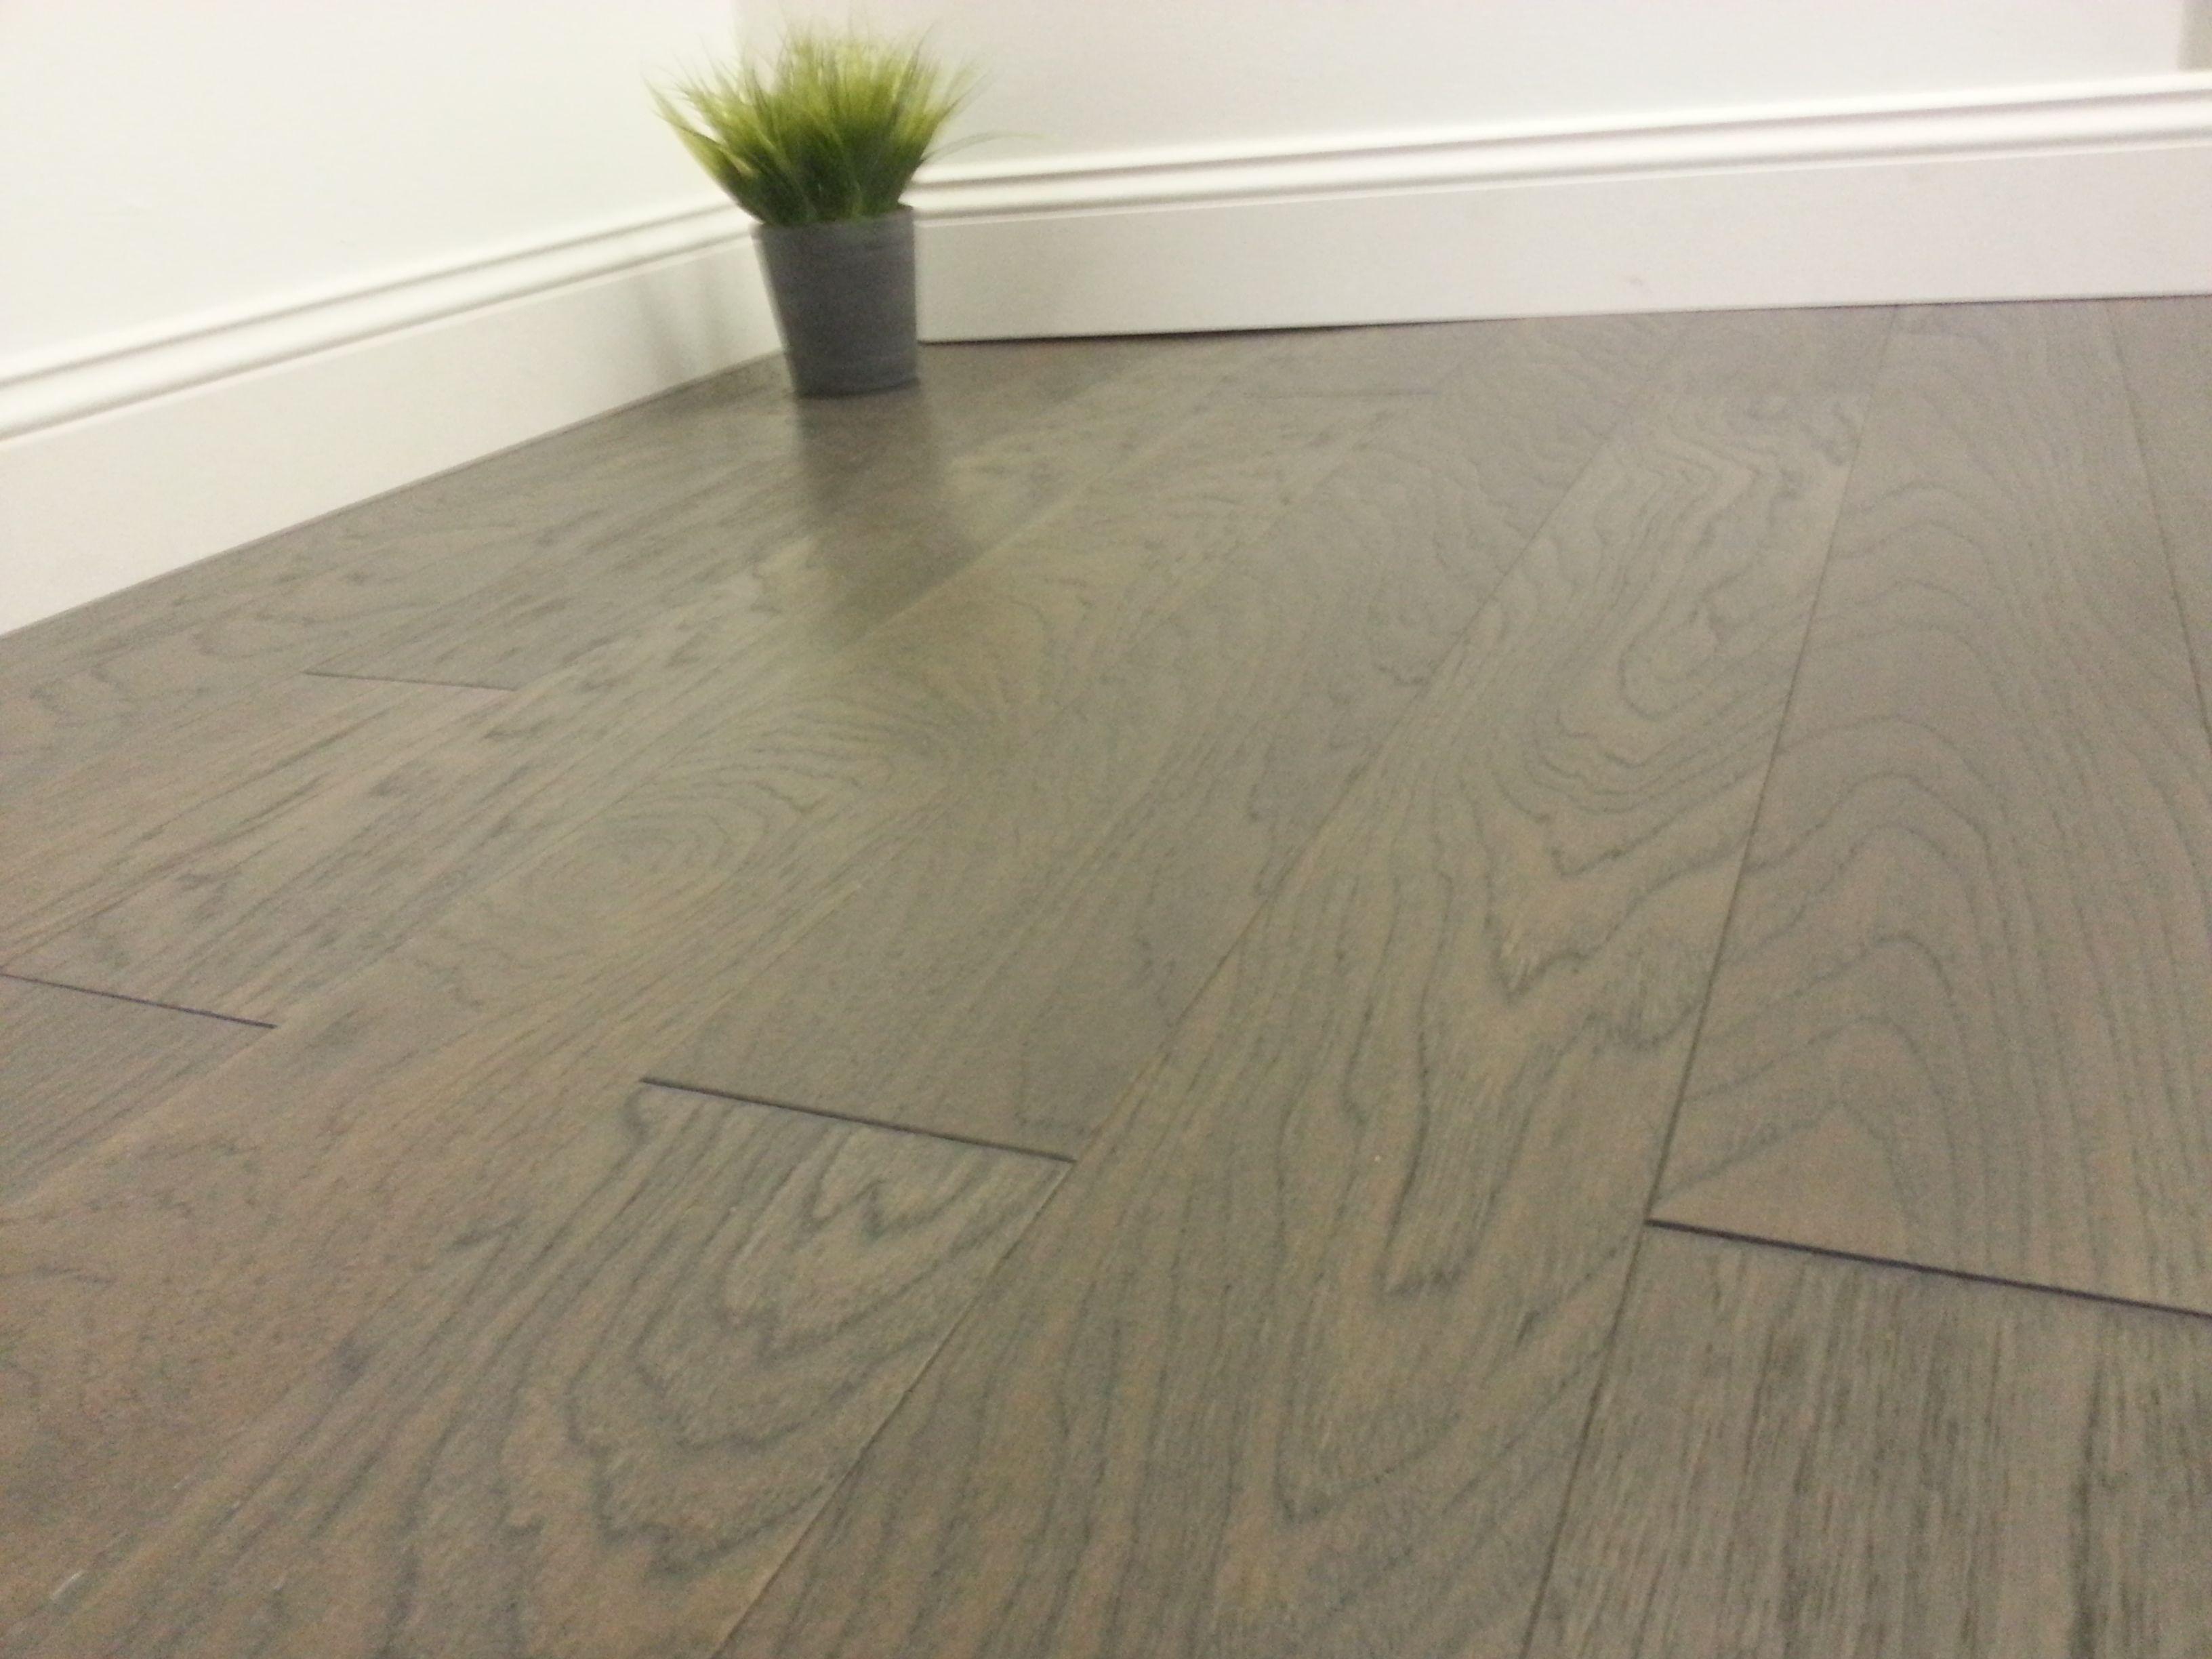 vinyl squarefoot mississauga product hickory image g t floors flooring engineered hardwood toronto ambiance oakville military tg